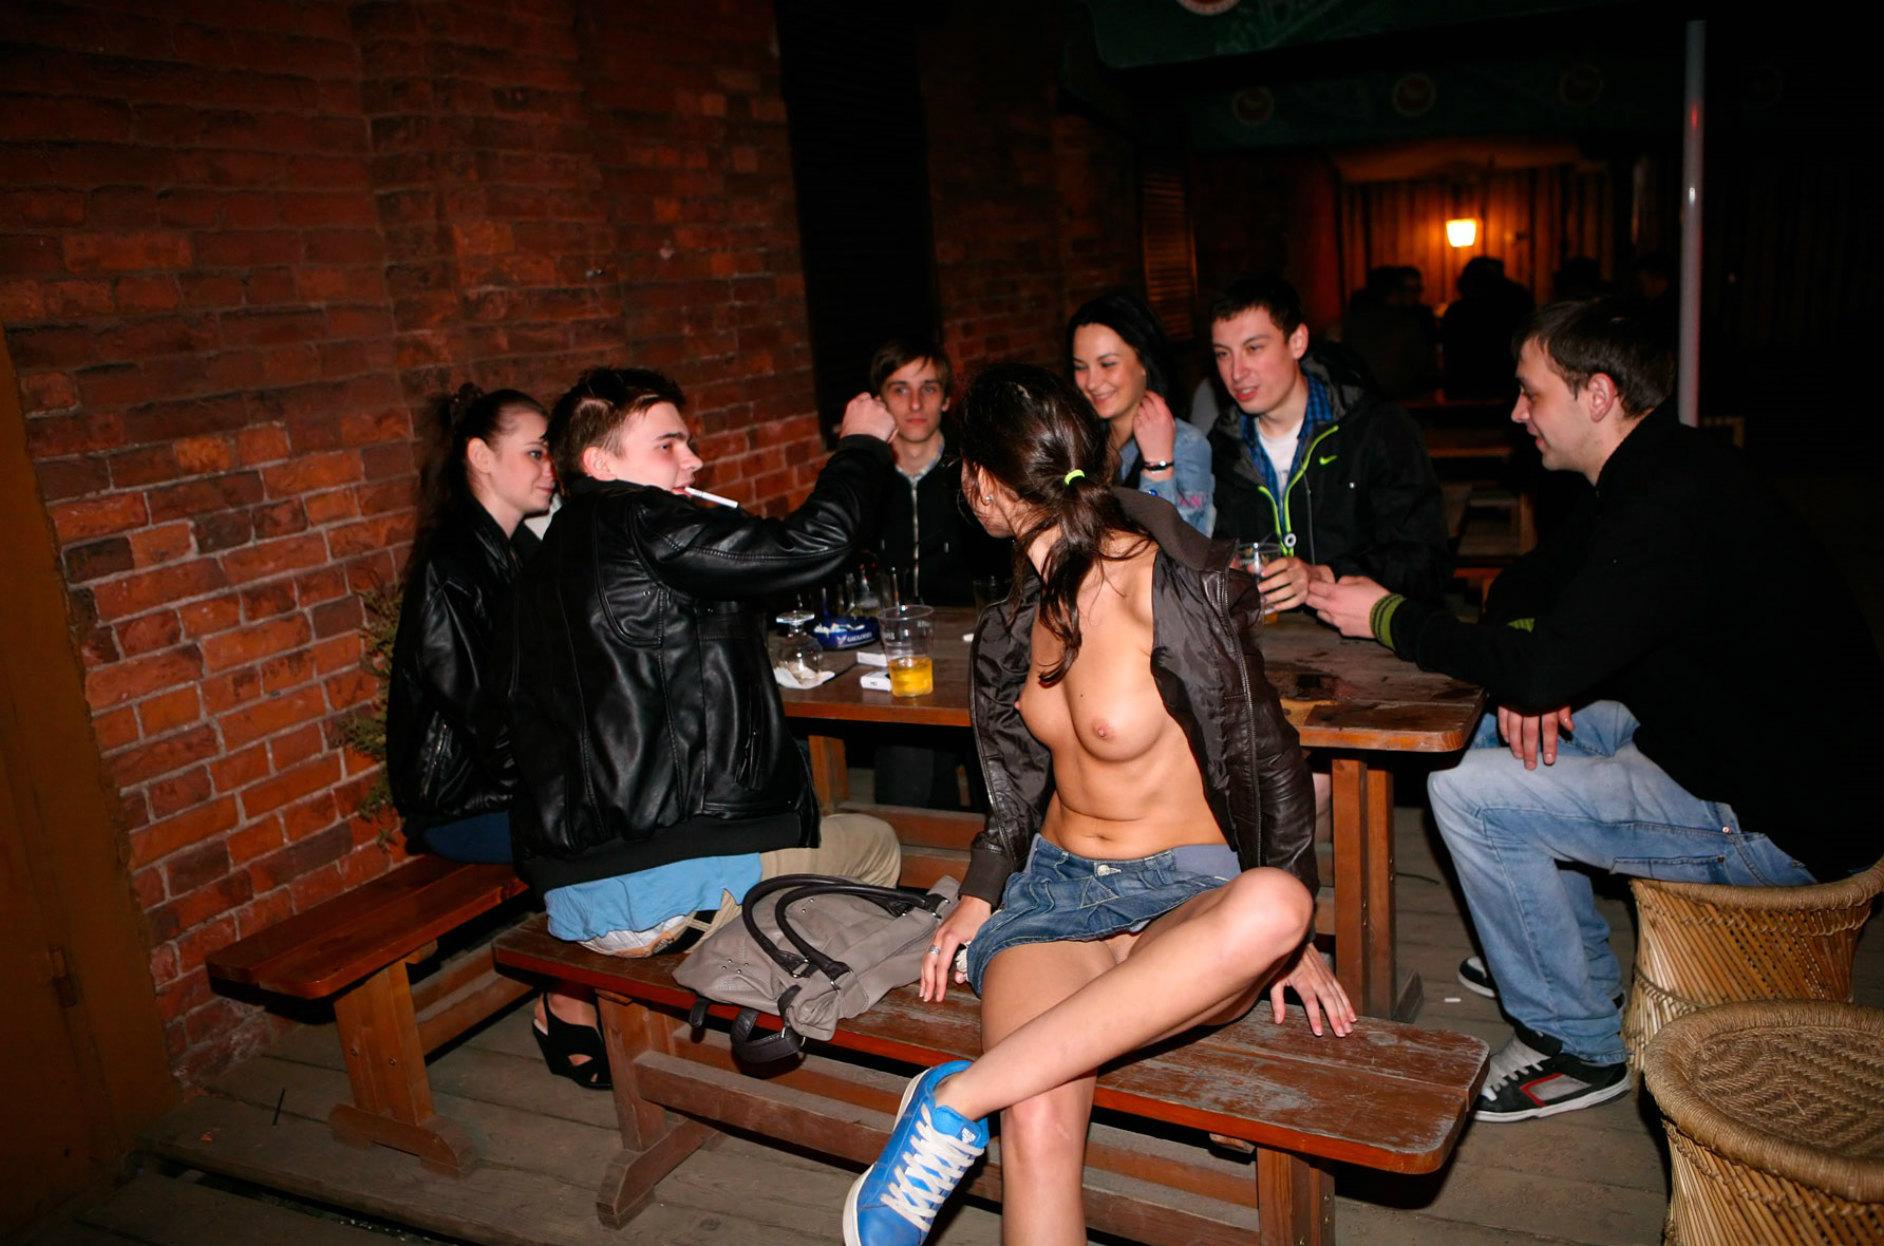 Girls in tight jean